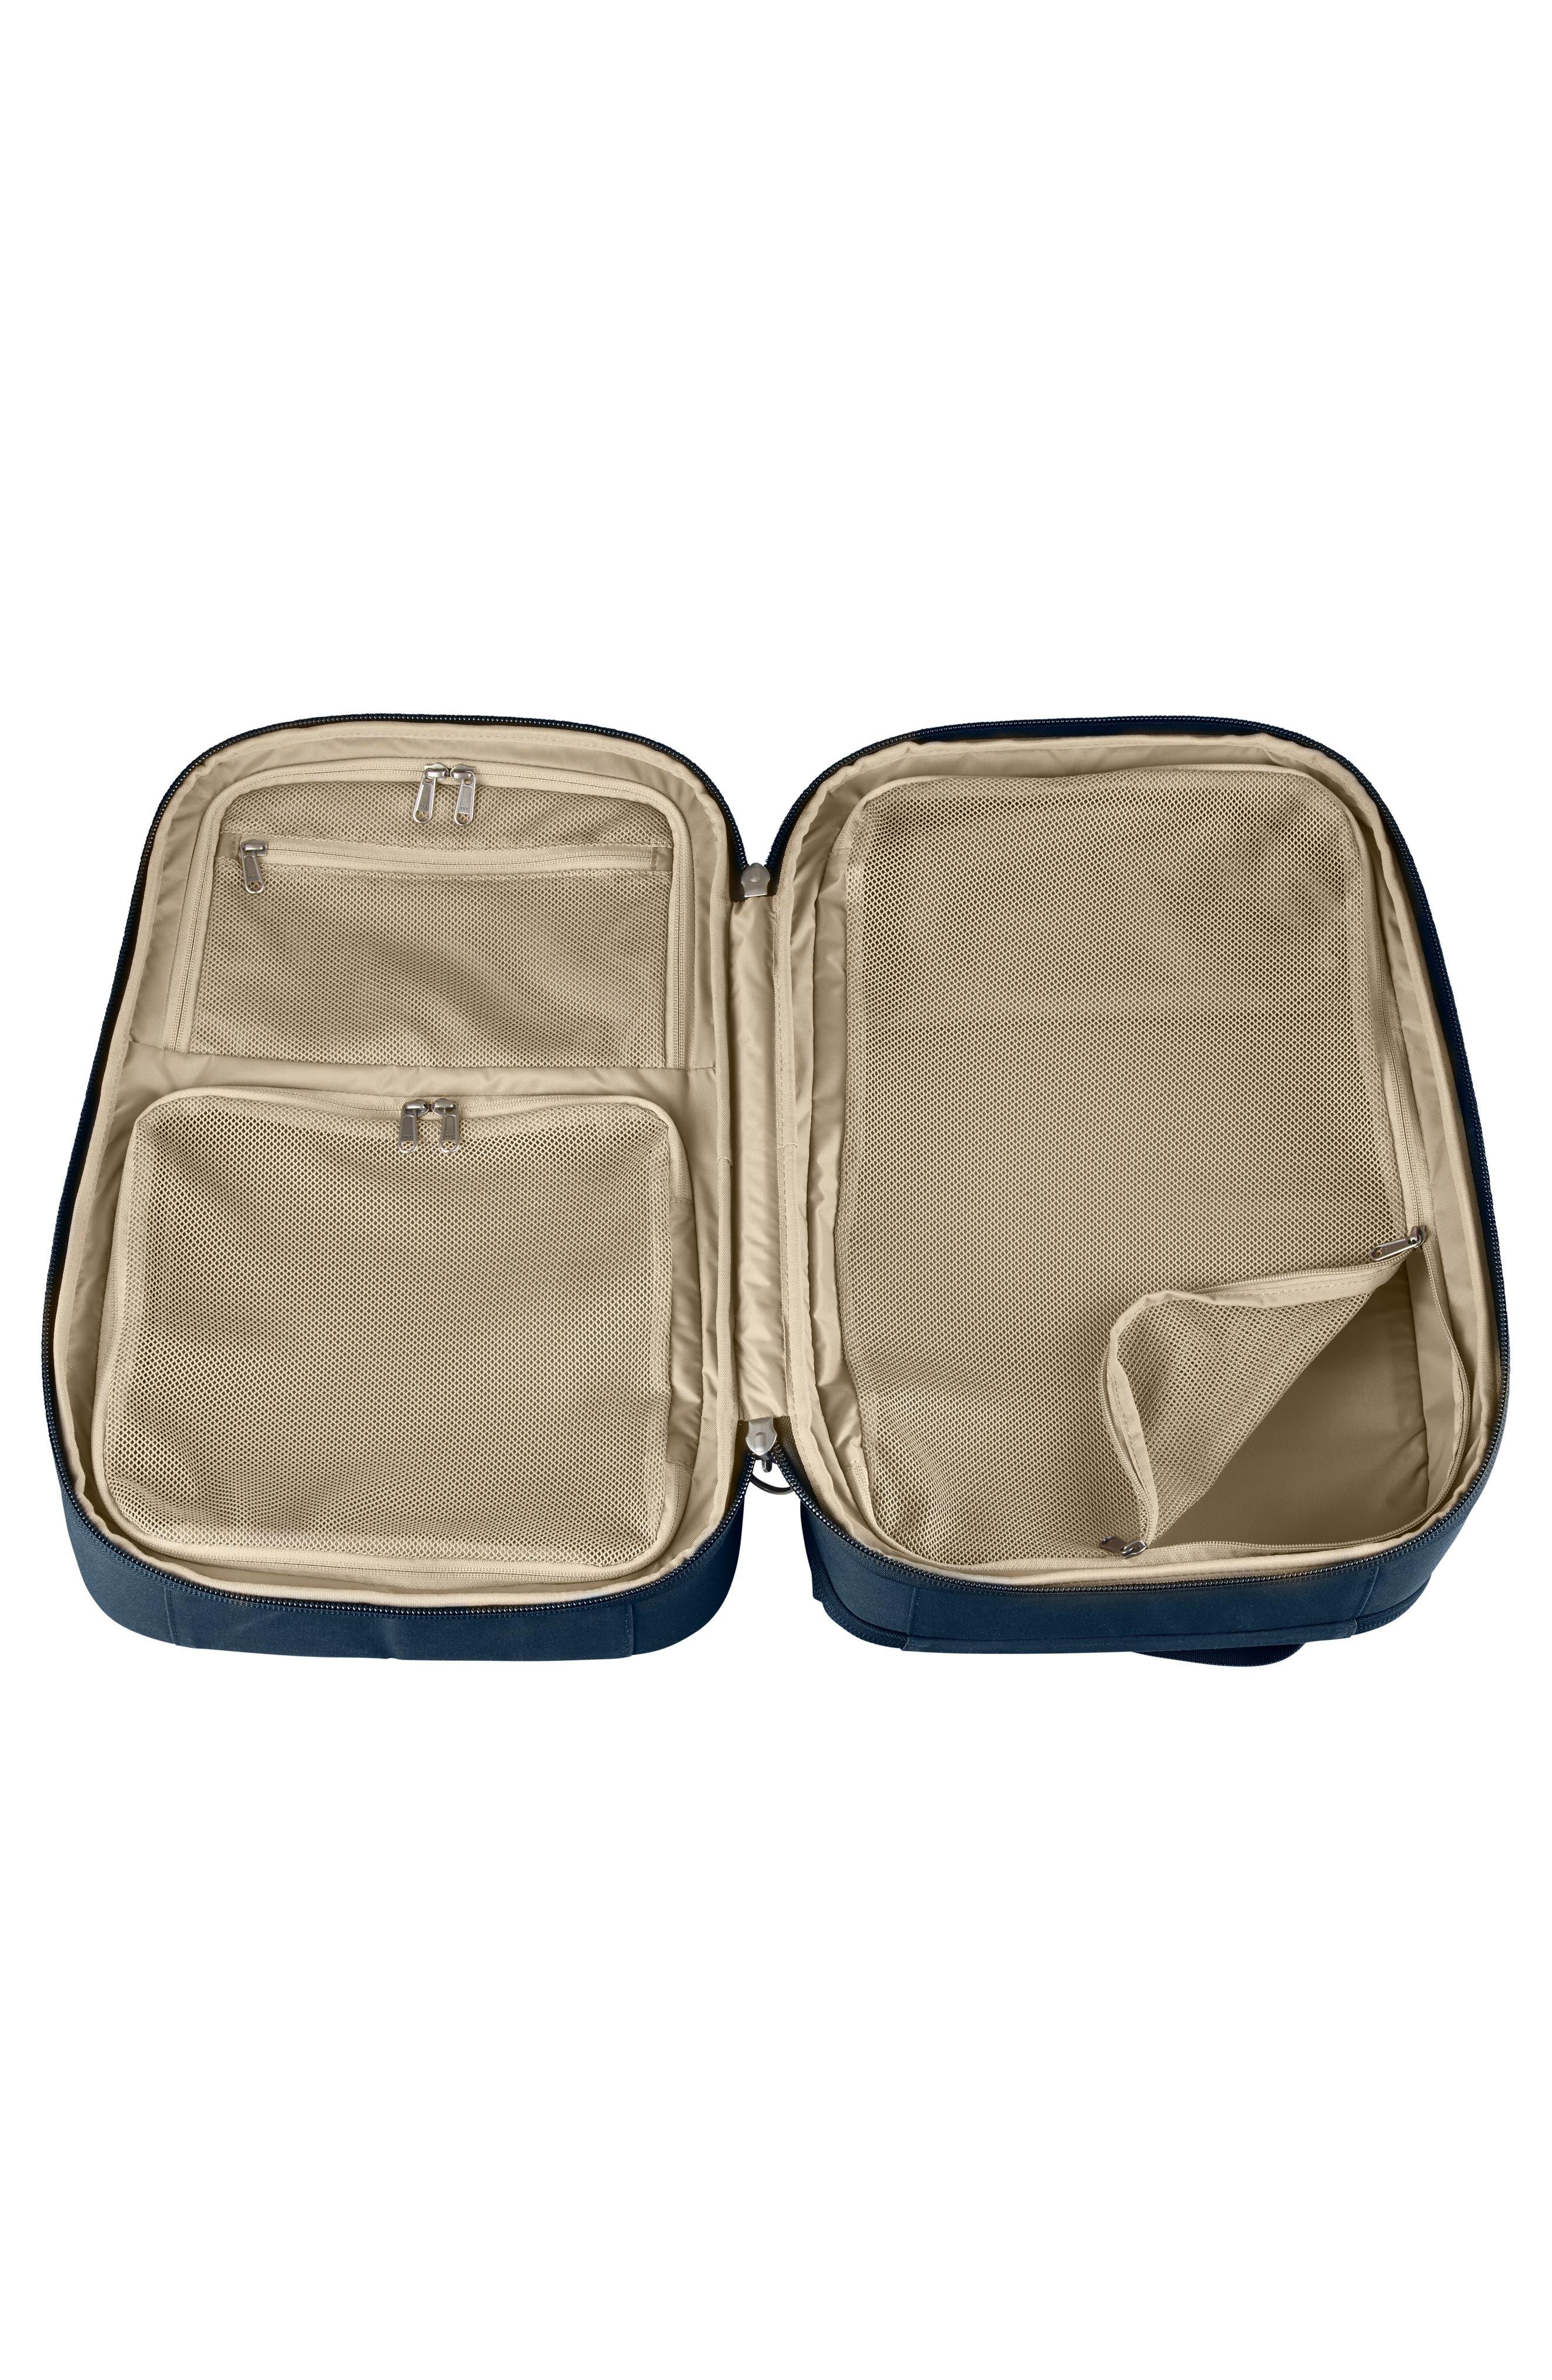 Travel Backpack,                             Alternate thumbnail 4, color,                             Navy